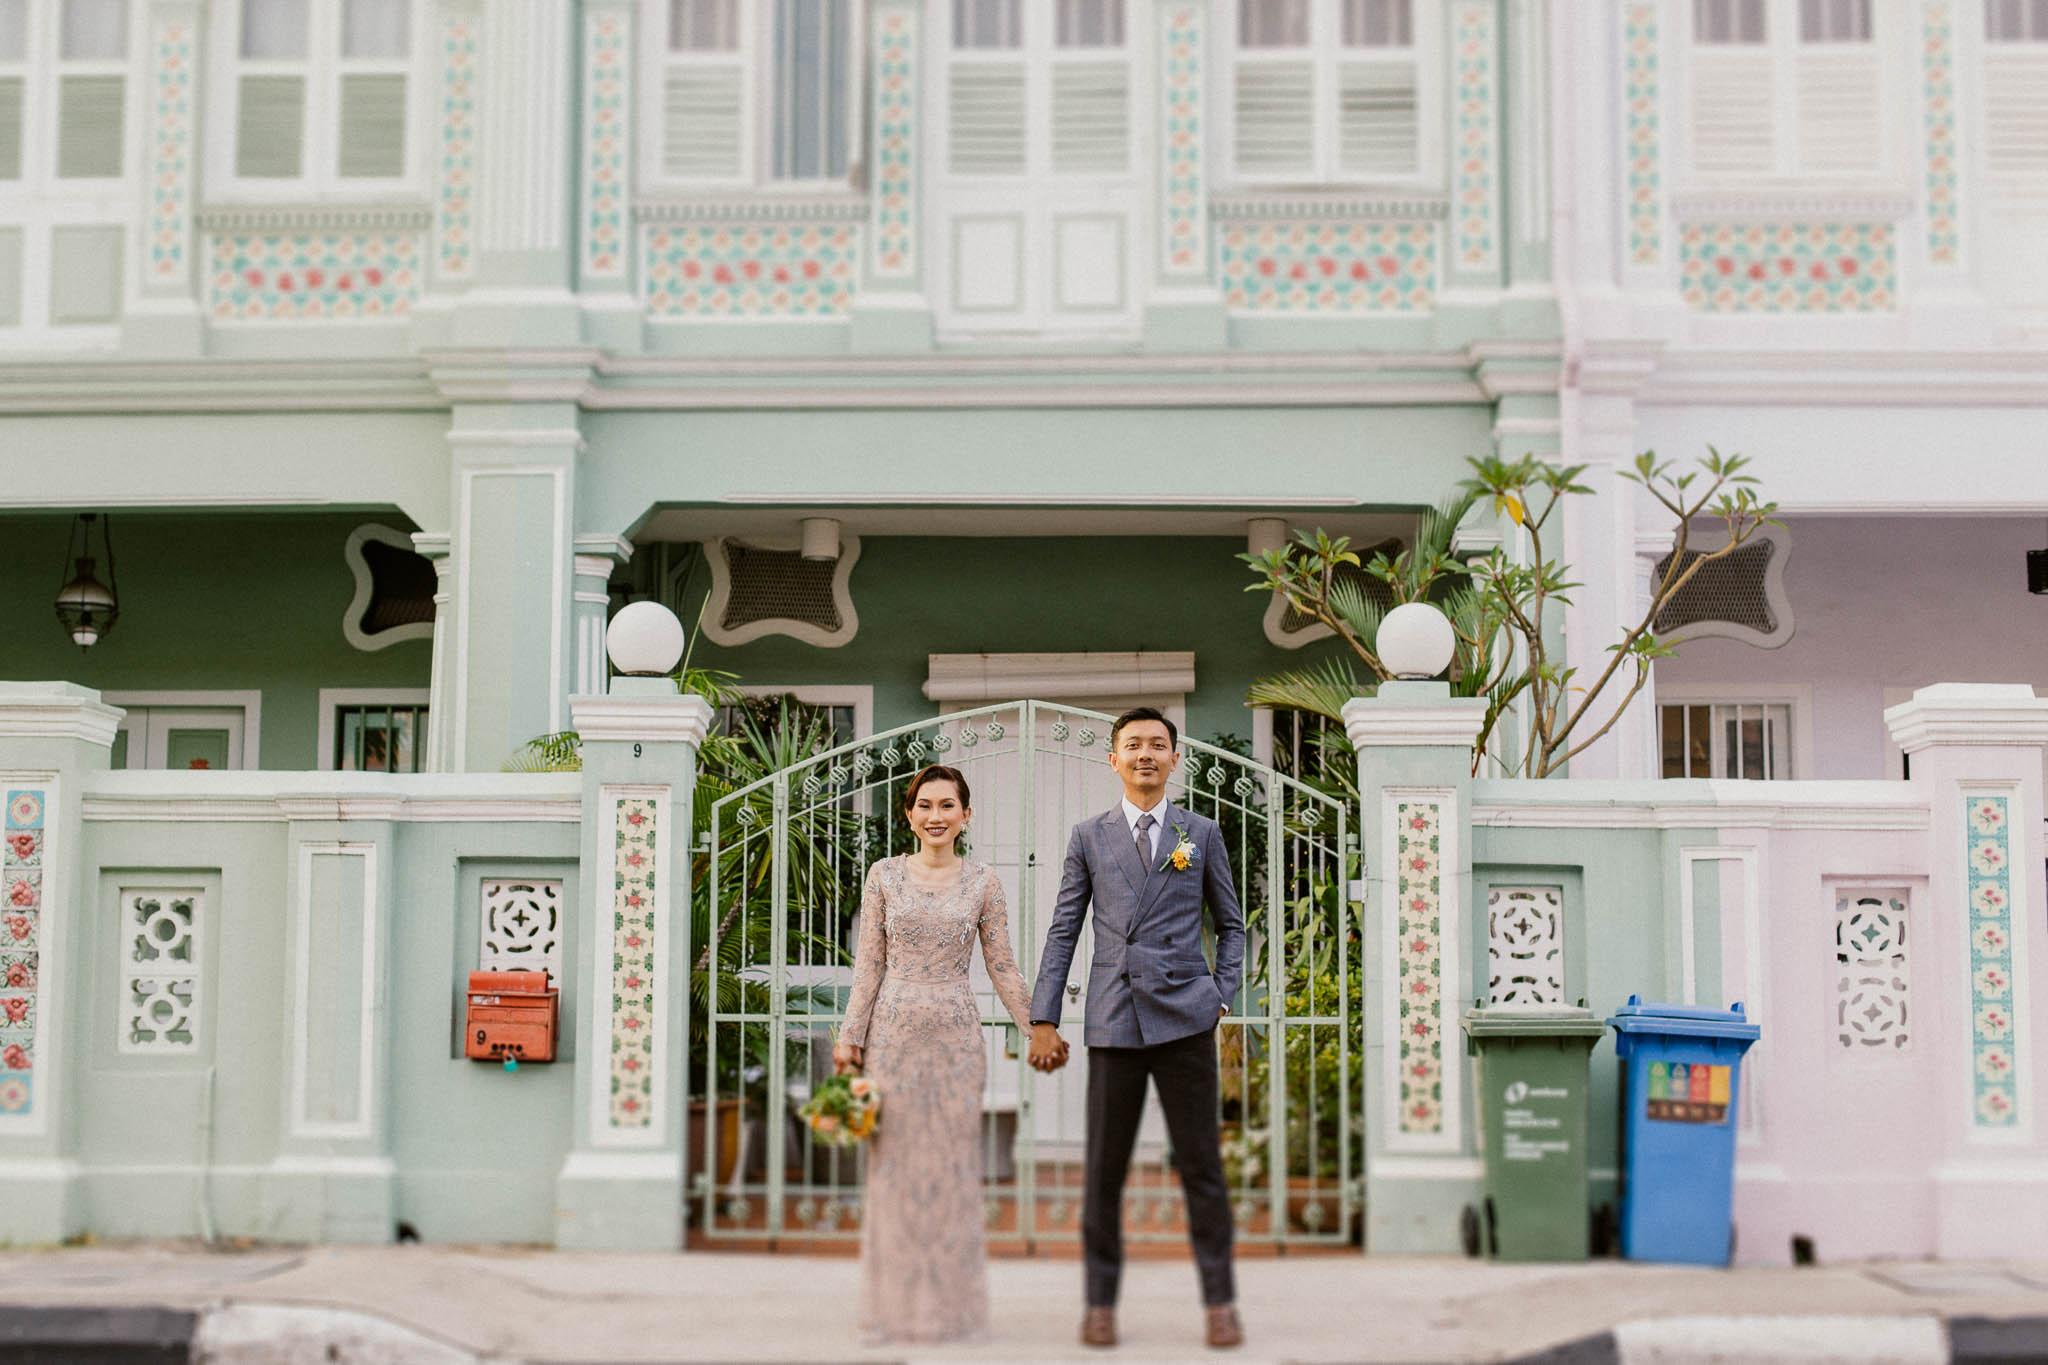 singapore-wedding-photographer-addafiq-nufail-075.jpg